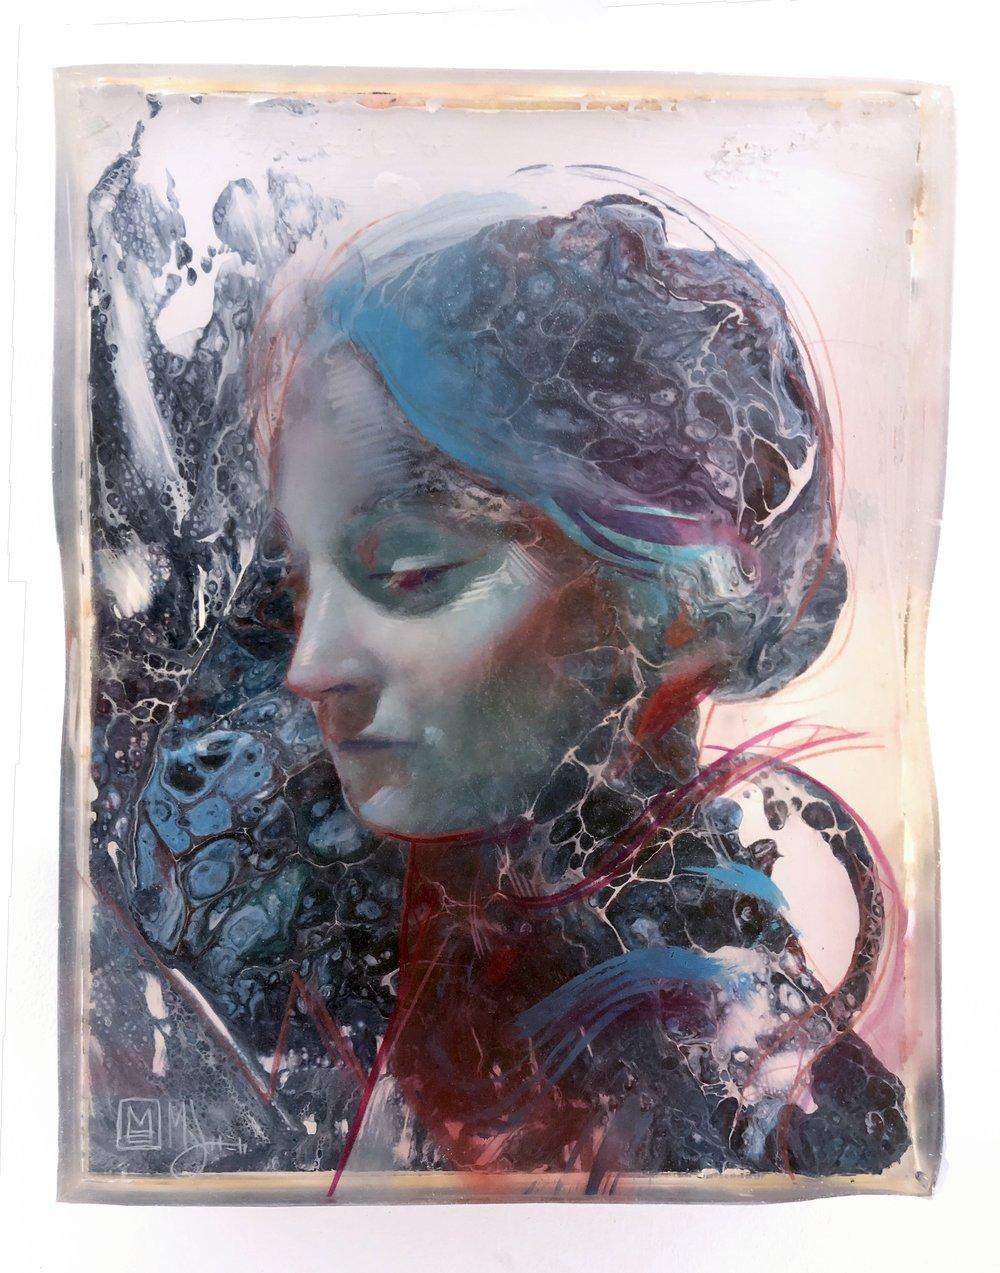 Marc Scheff - Mother Mary - Acrylic Block Print - 5x7- Edition 20 -  2019 - $100.jpg